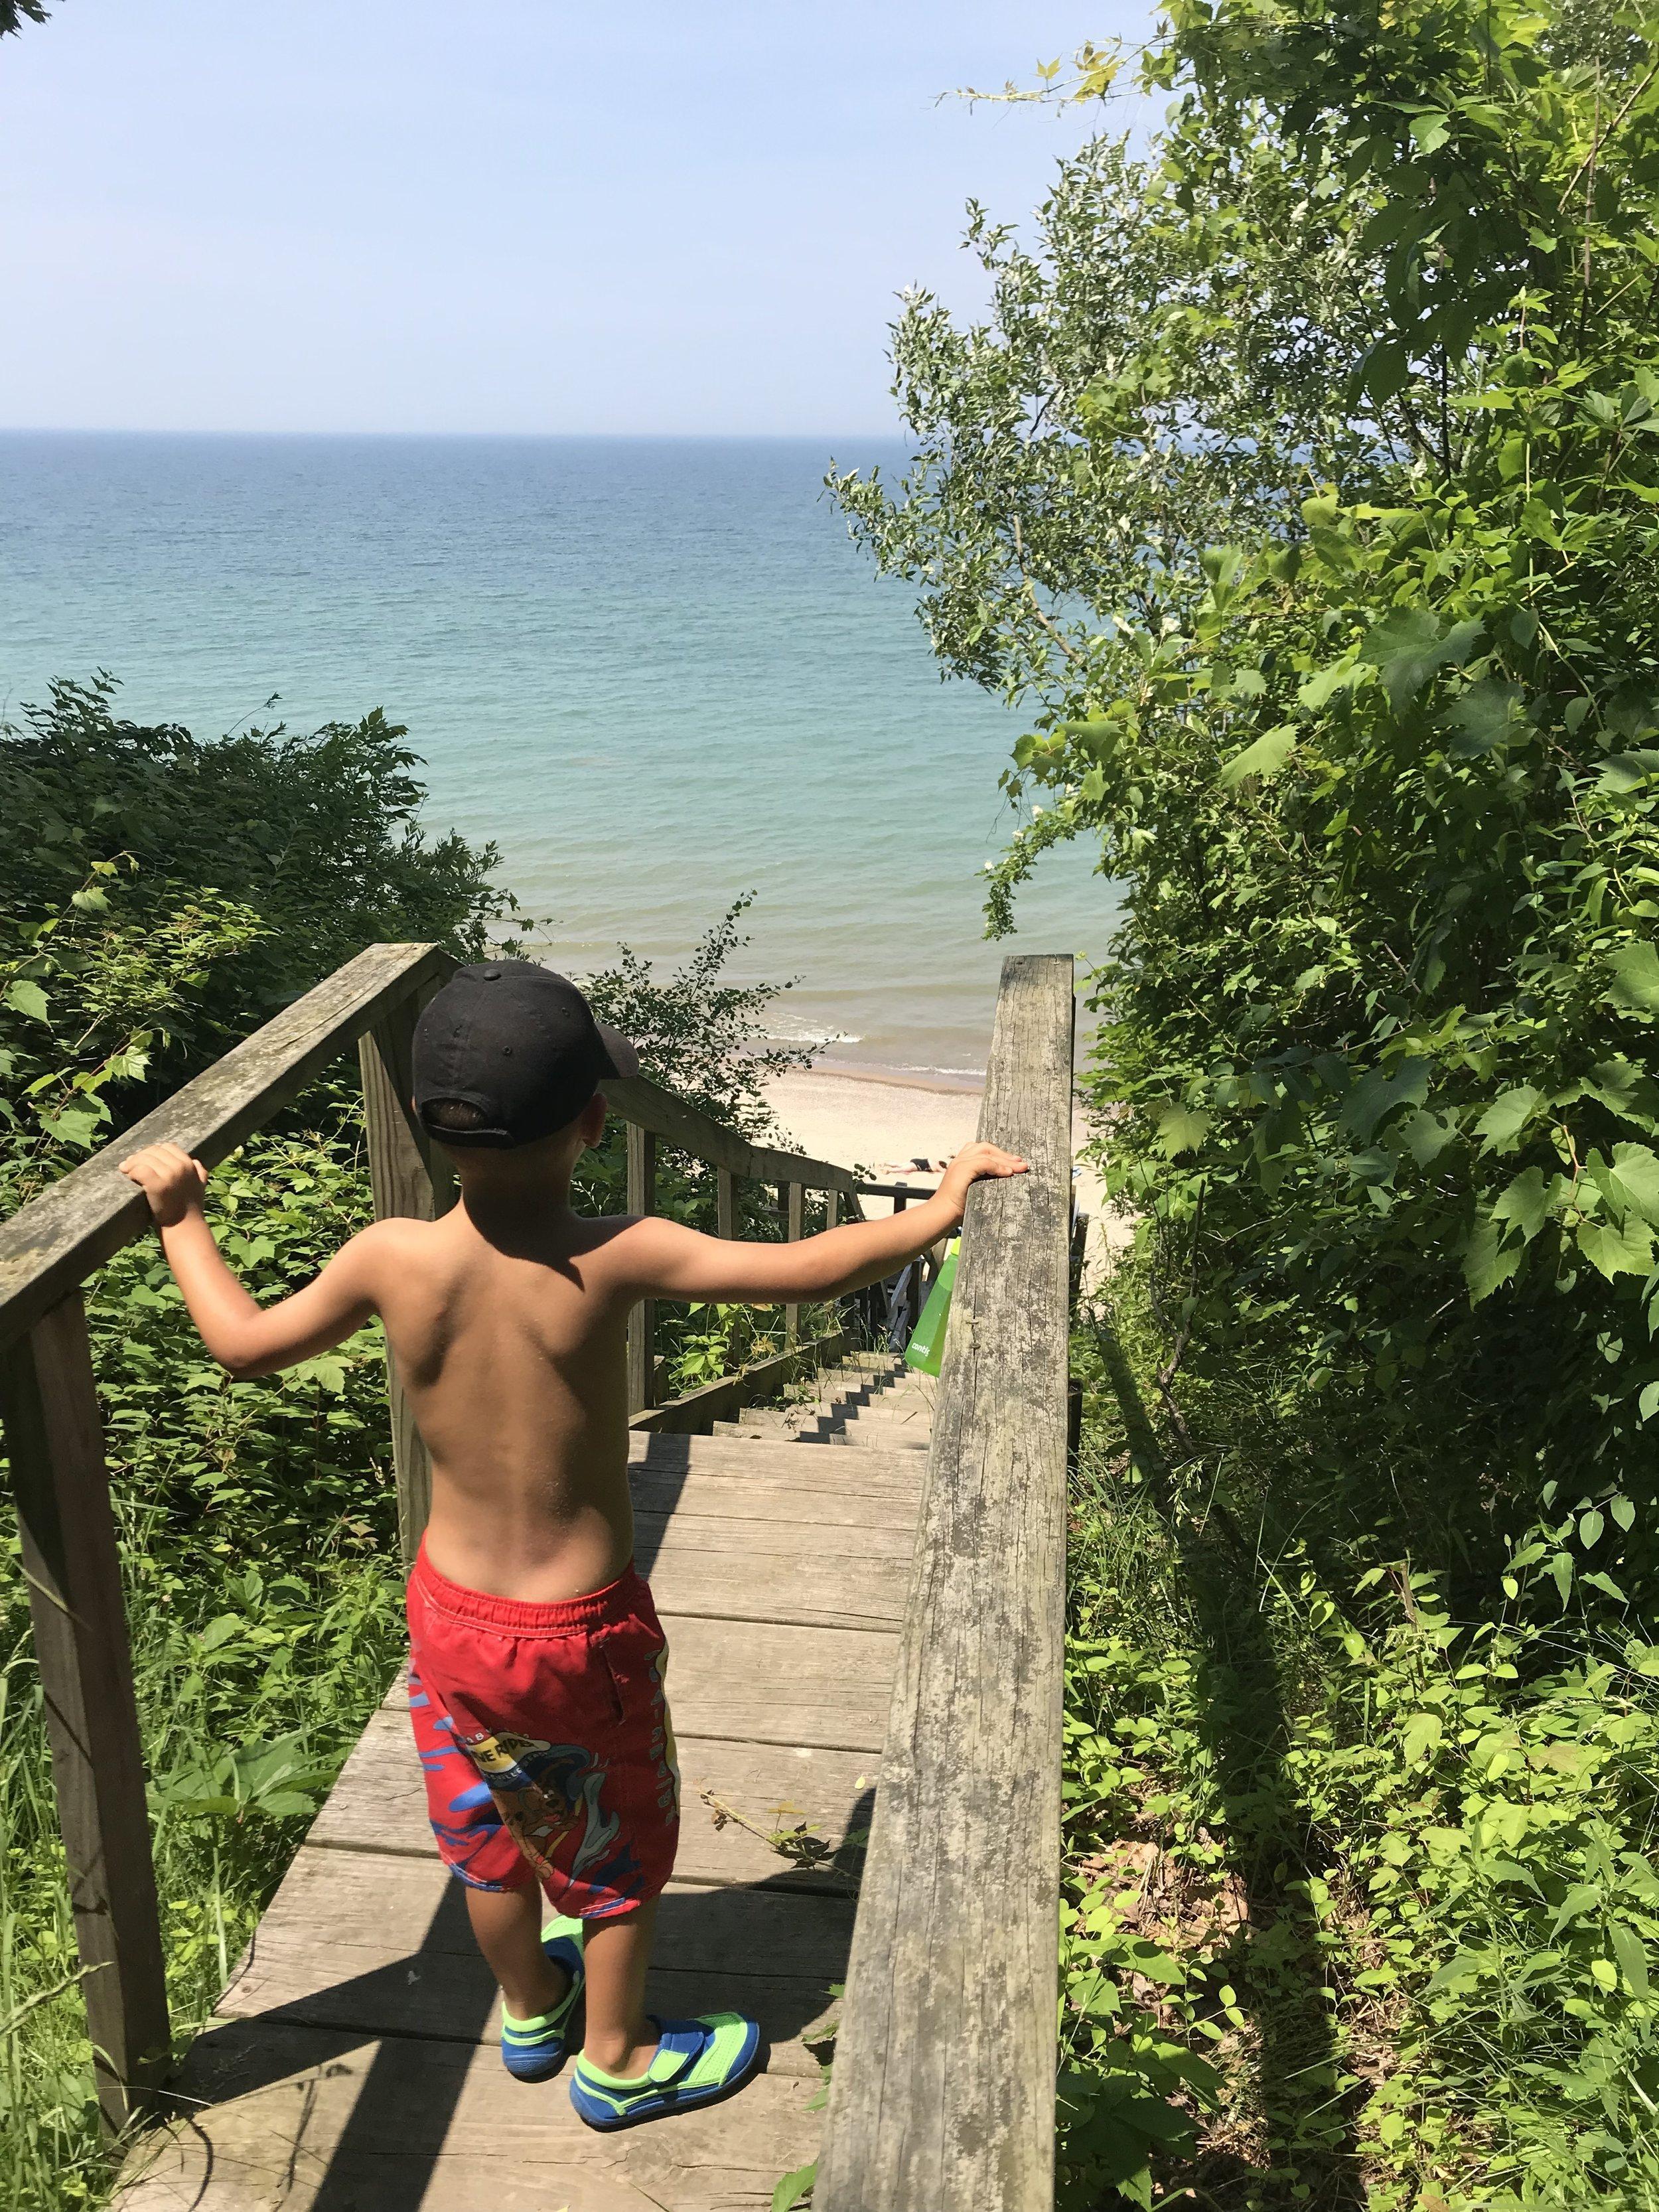 Beach staircase   Glenn, MI   June